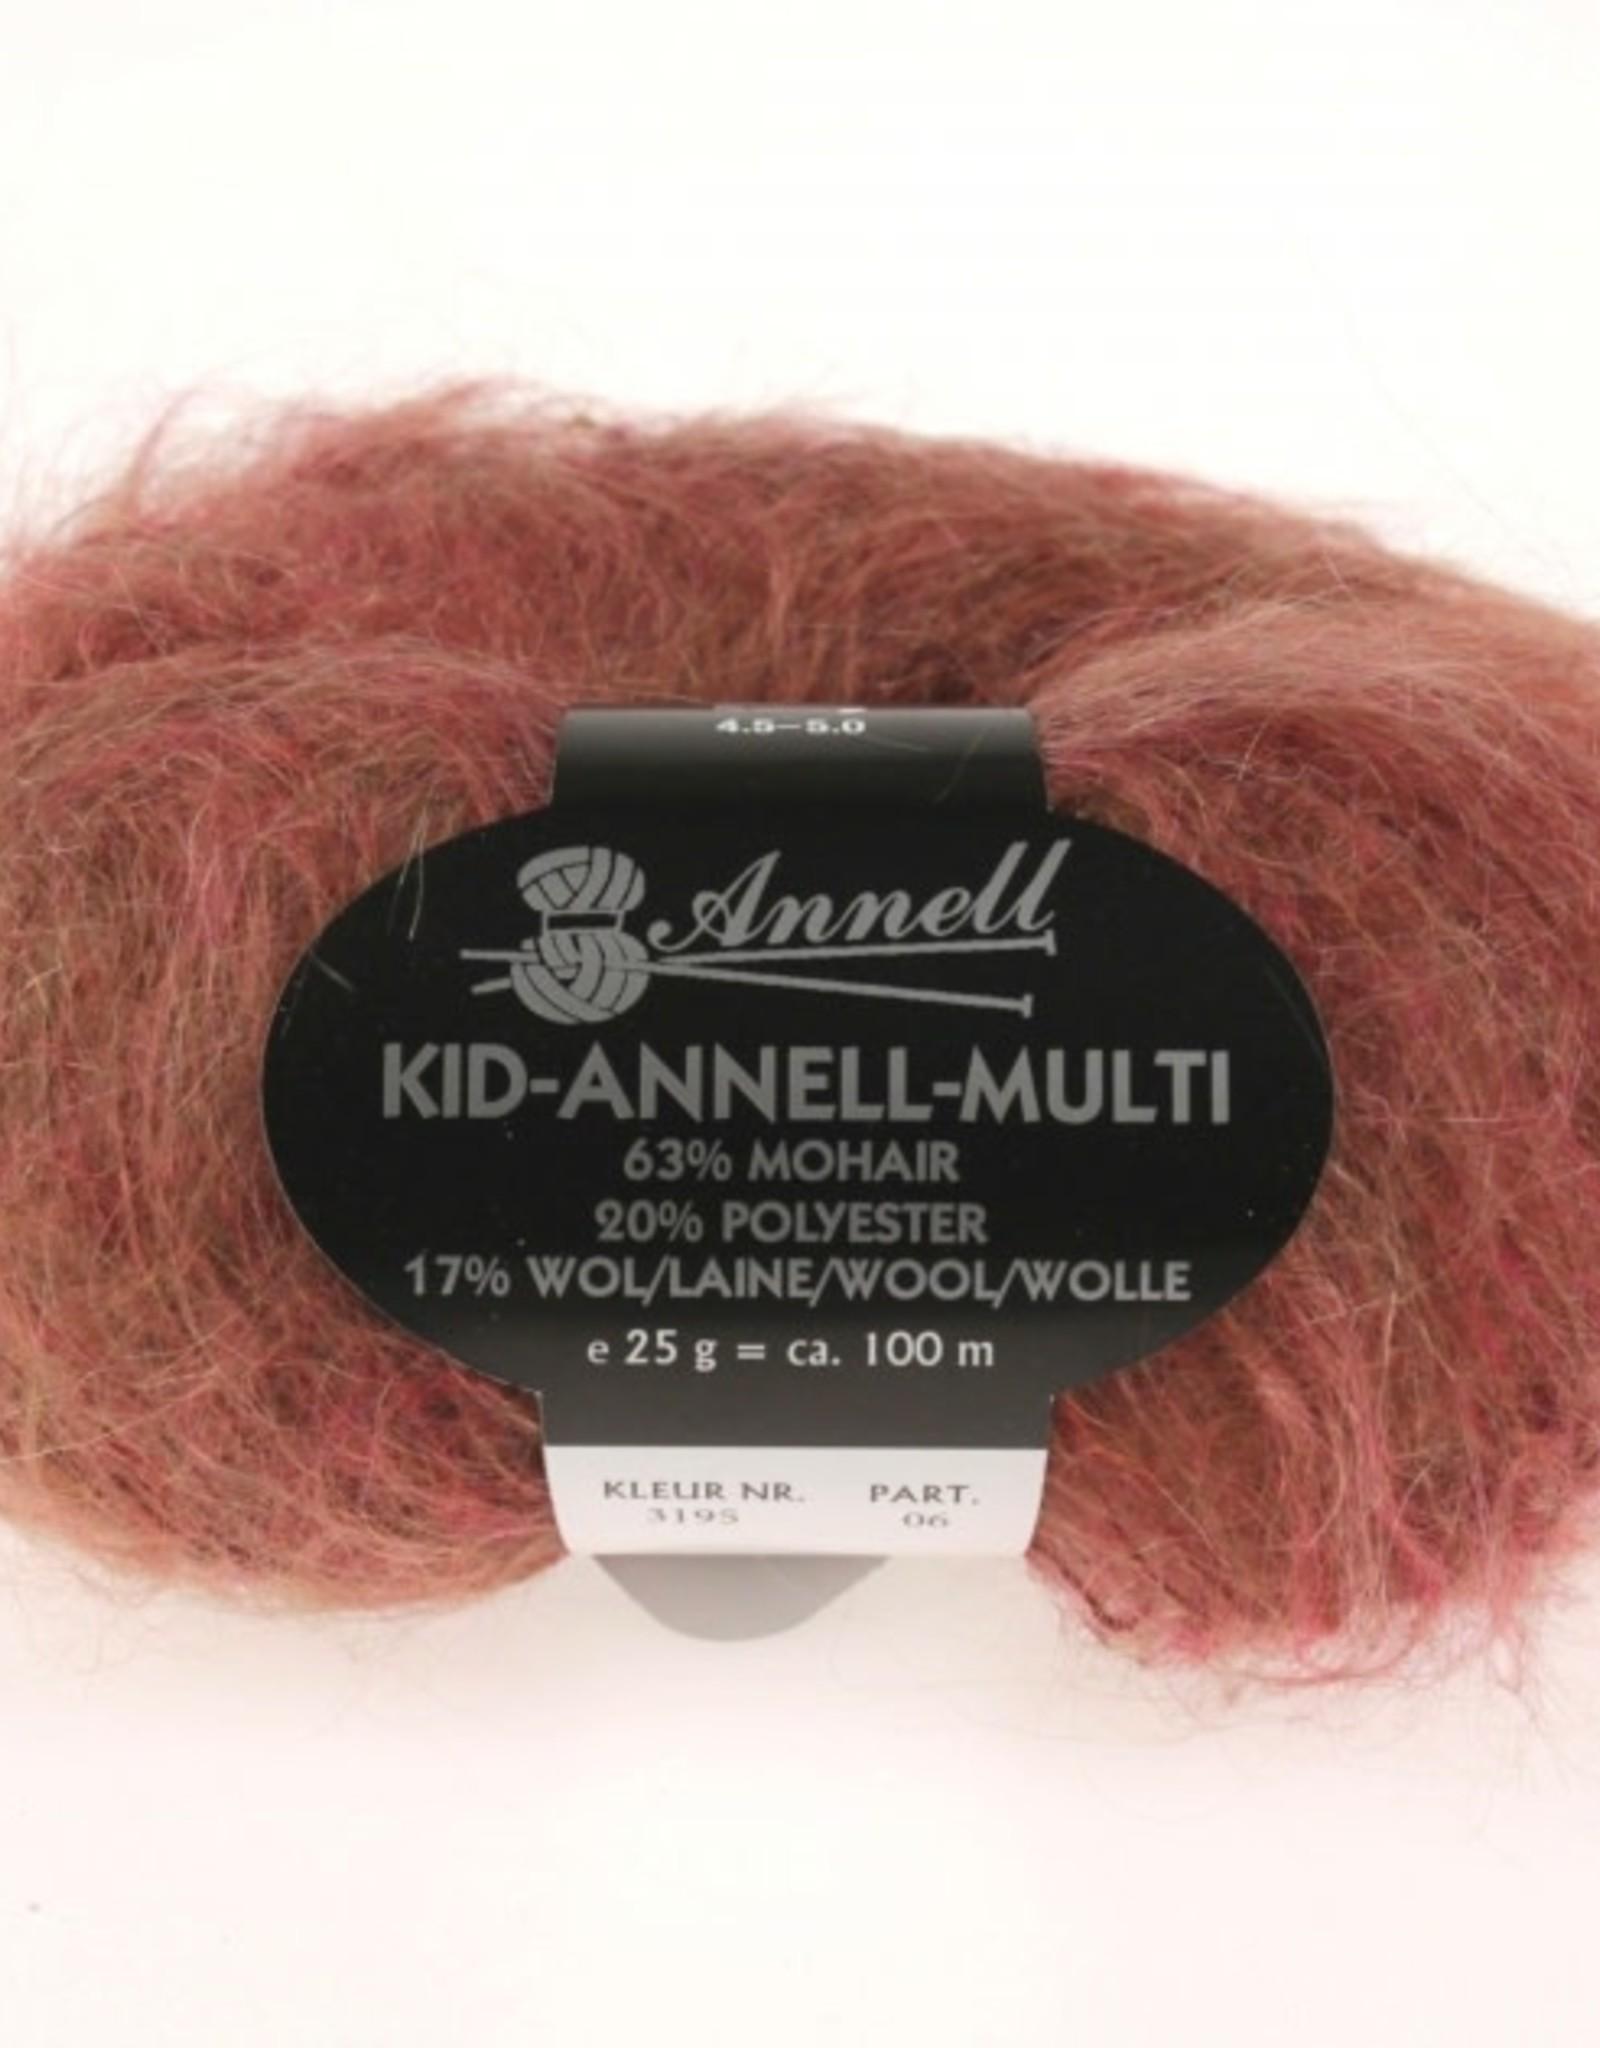 Annell Annell Kid Annell multi 3195